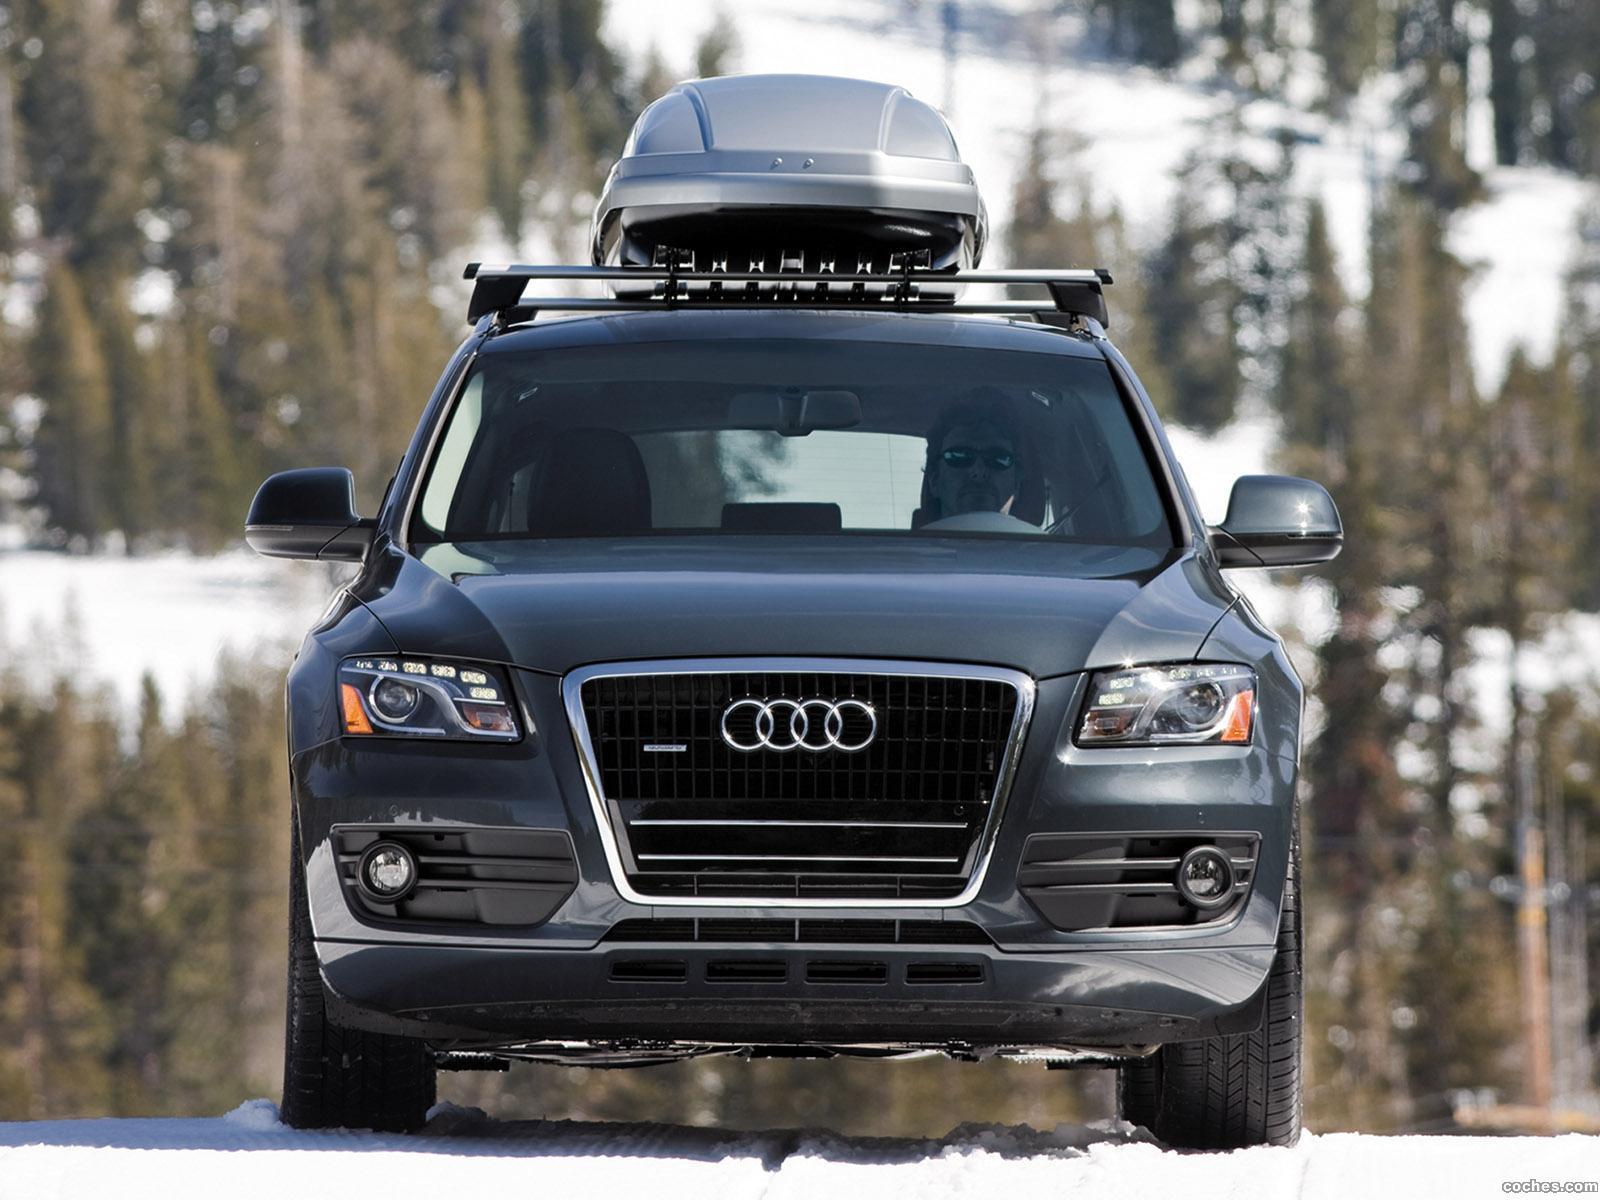 Foto 12 de Audi Q5 3.2 Quattro USA 2009